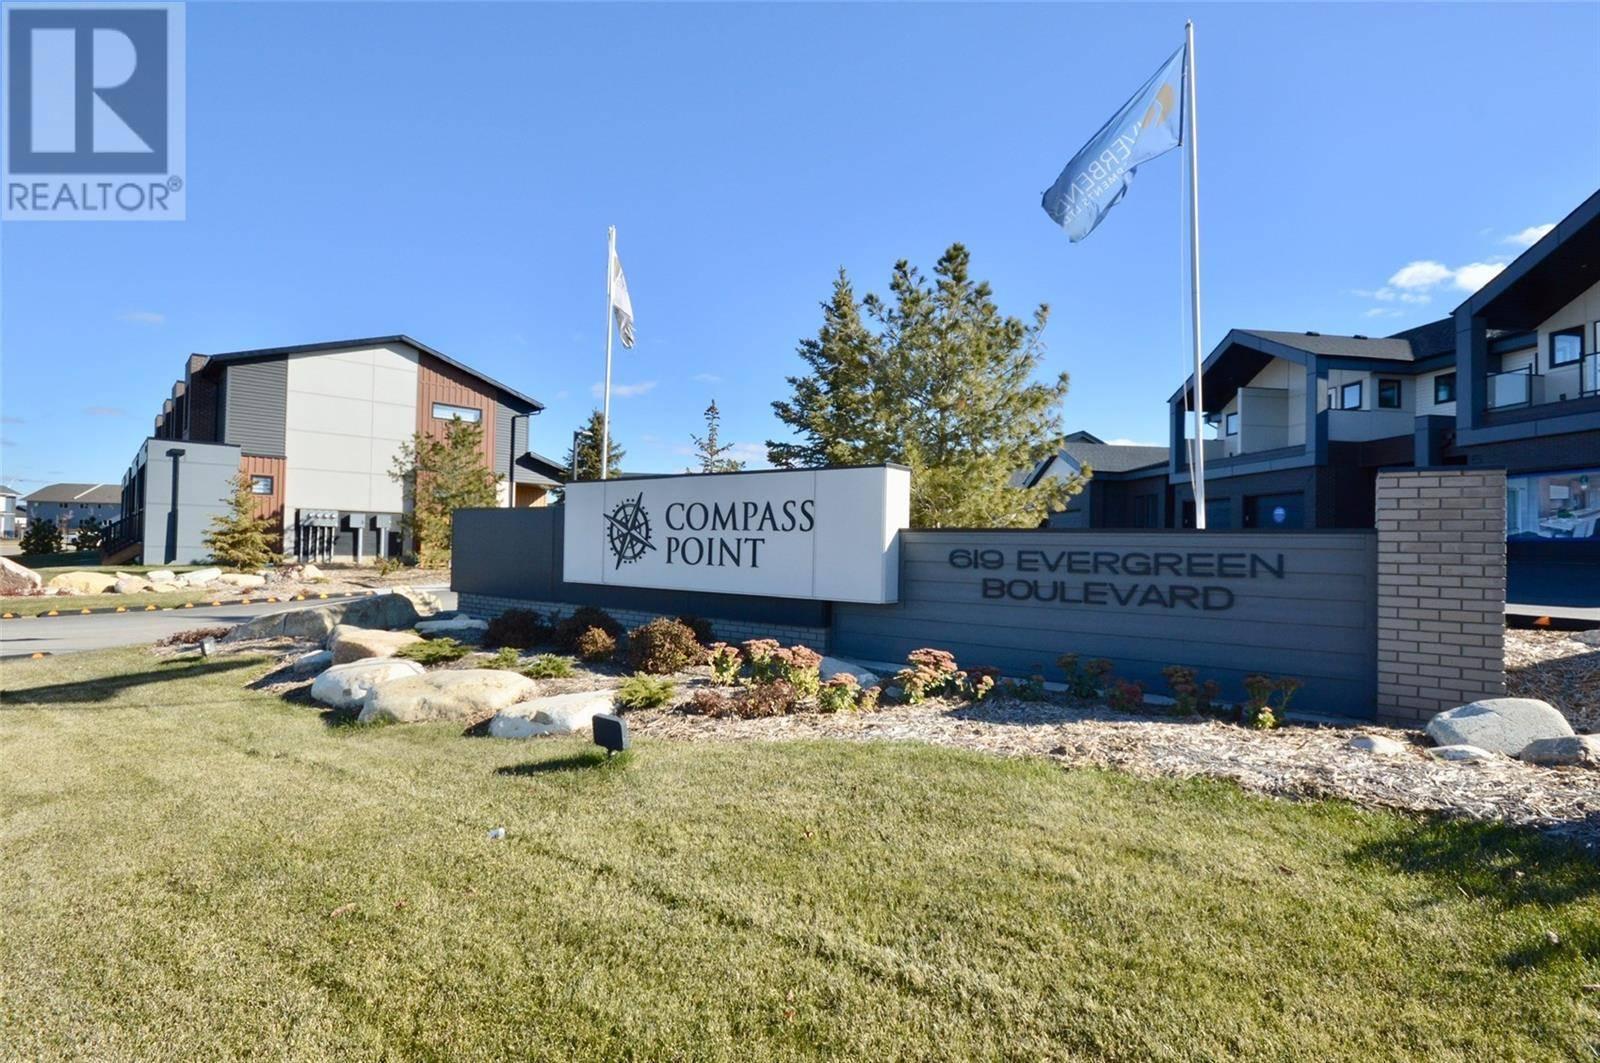 Townhouse for sale at 649 Evergreen Blvd Saskatoon Saskatchewan - MLS: SK793418